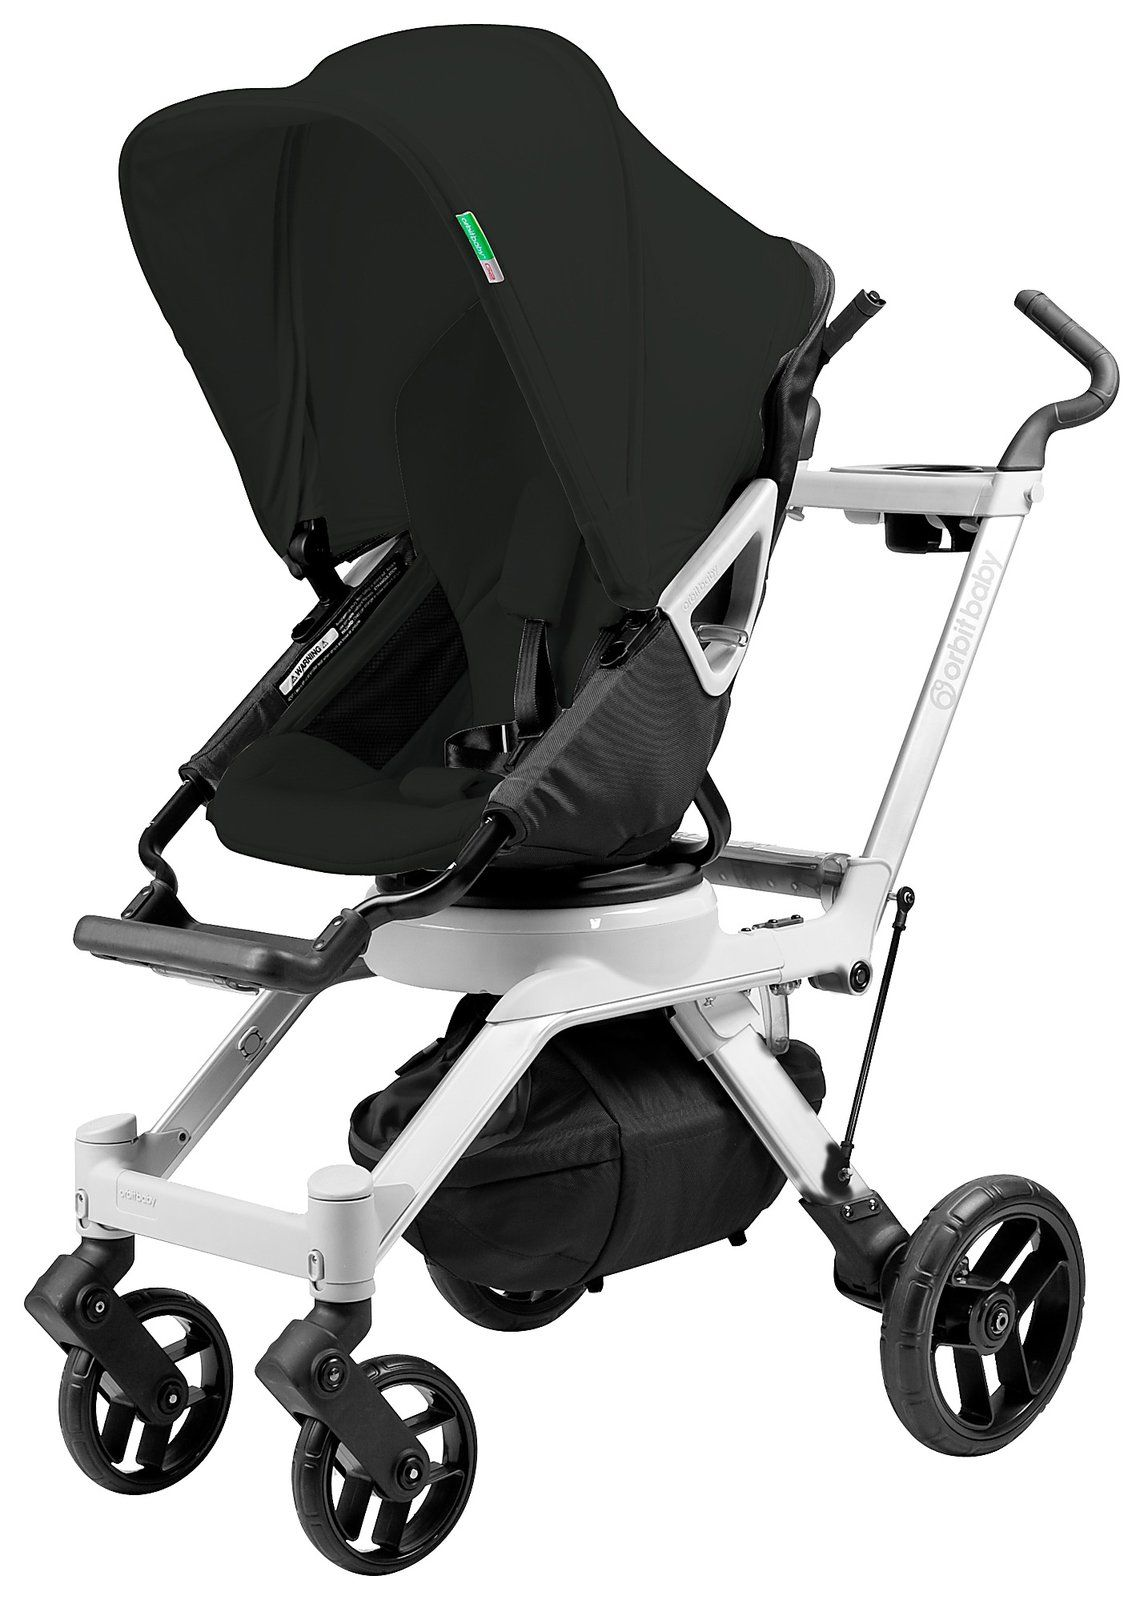 Orbit Baby Color Pack for Stroller Seat G2 Black